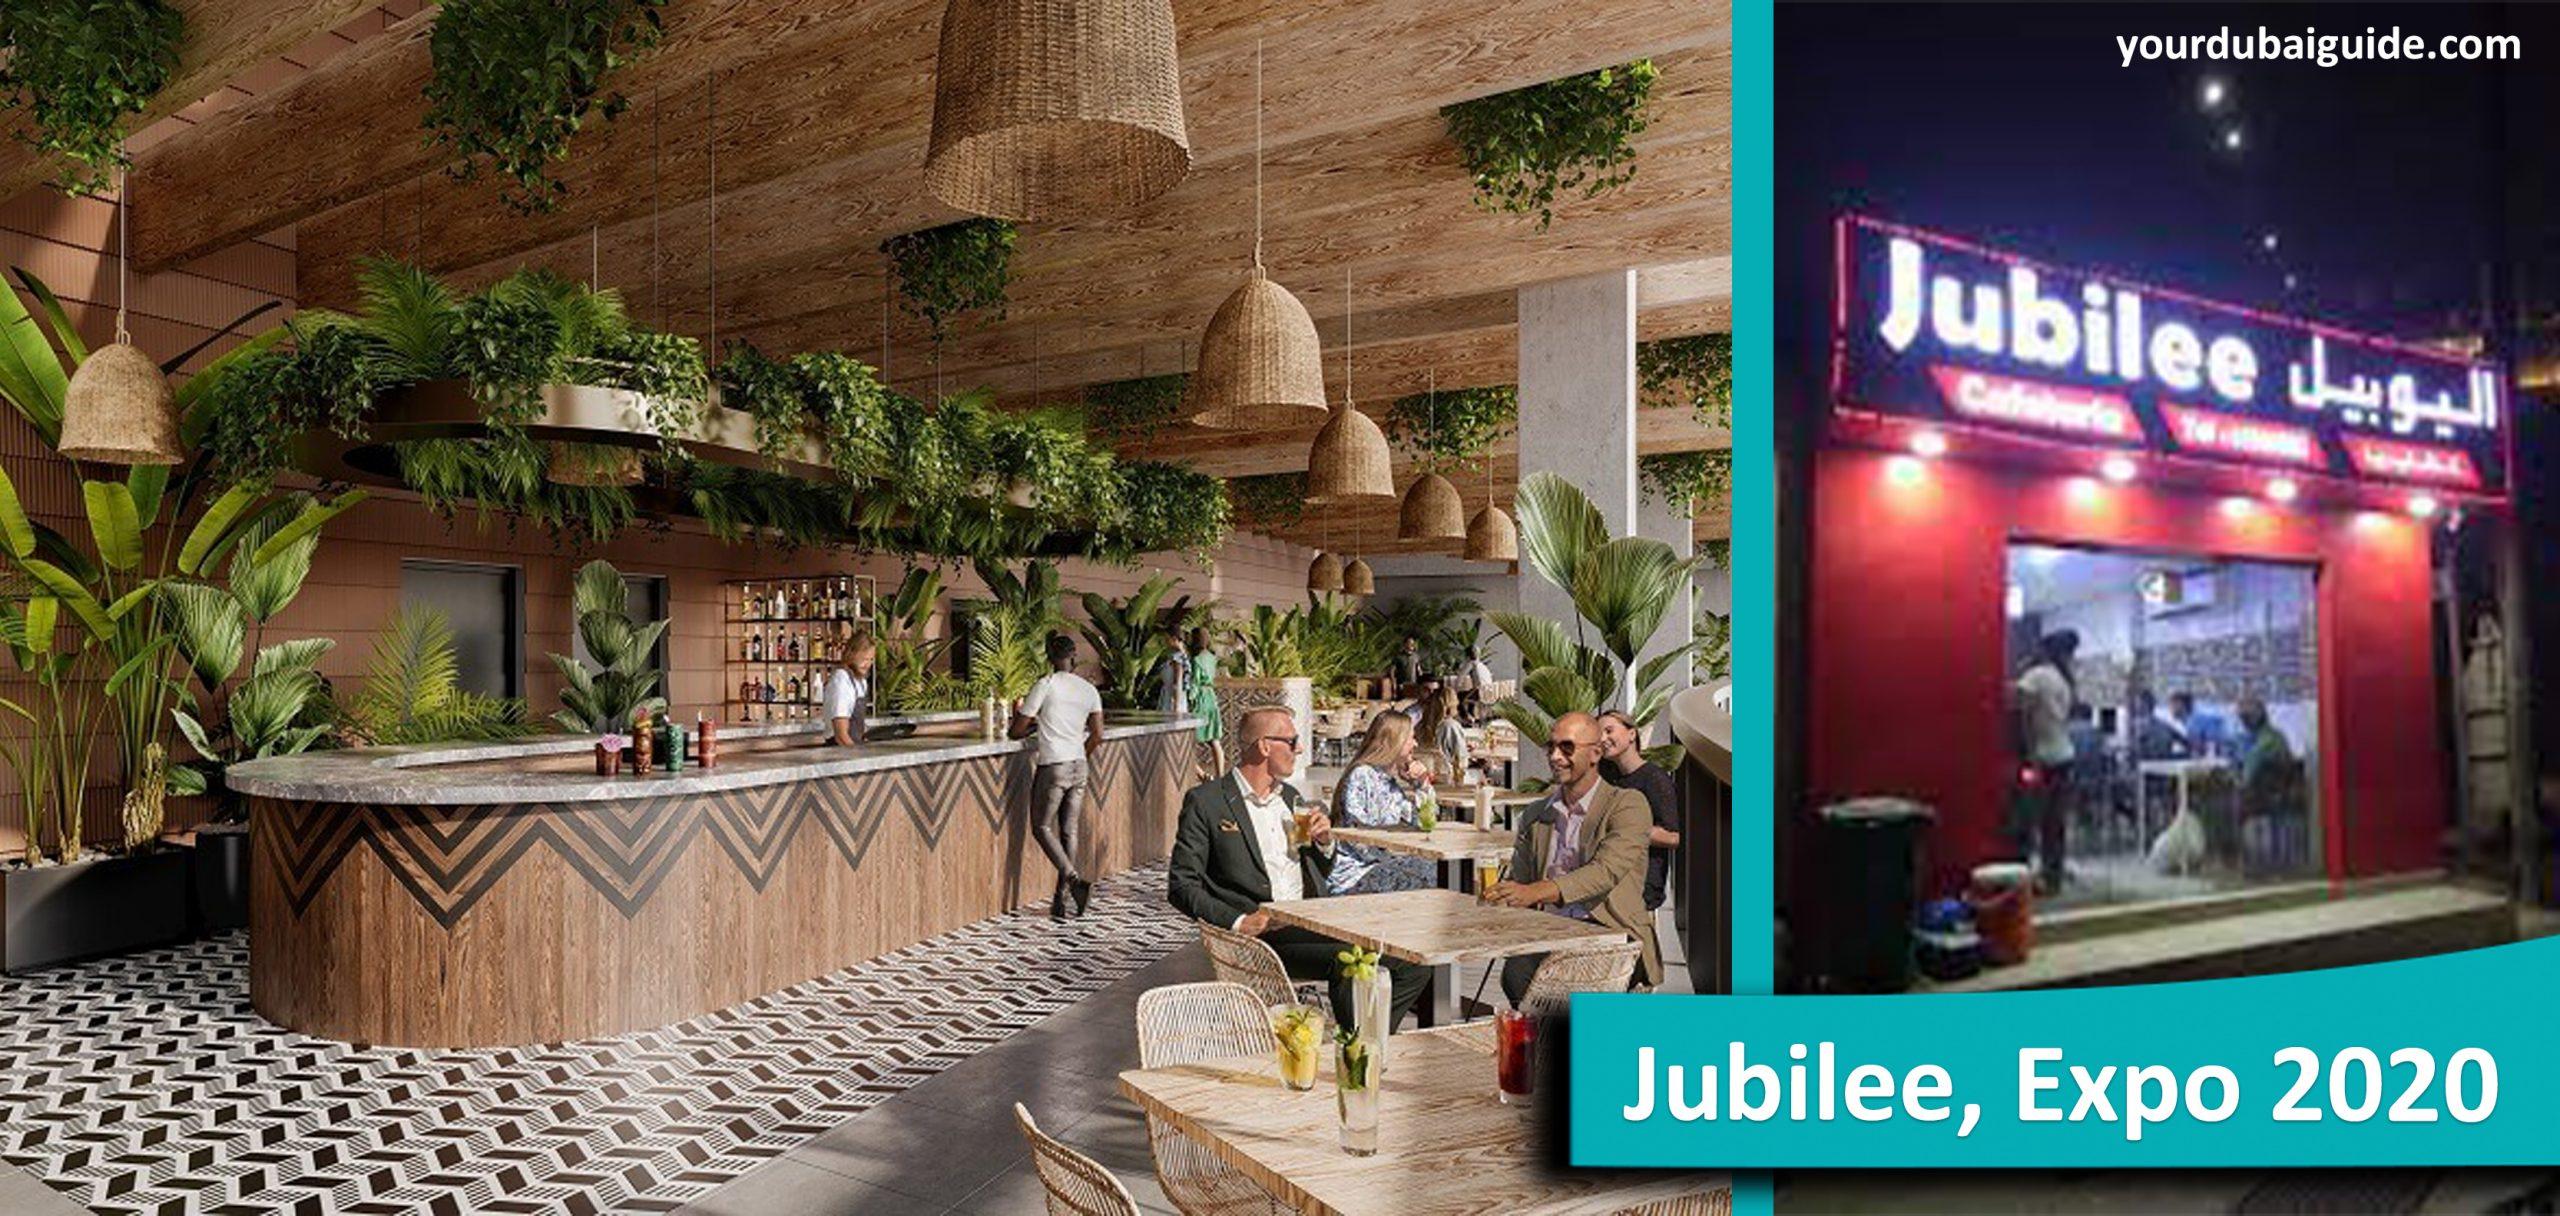 Jubilee at Expo 2020, Dubai